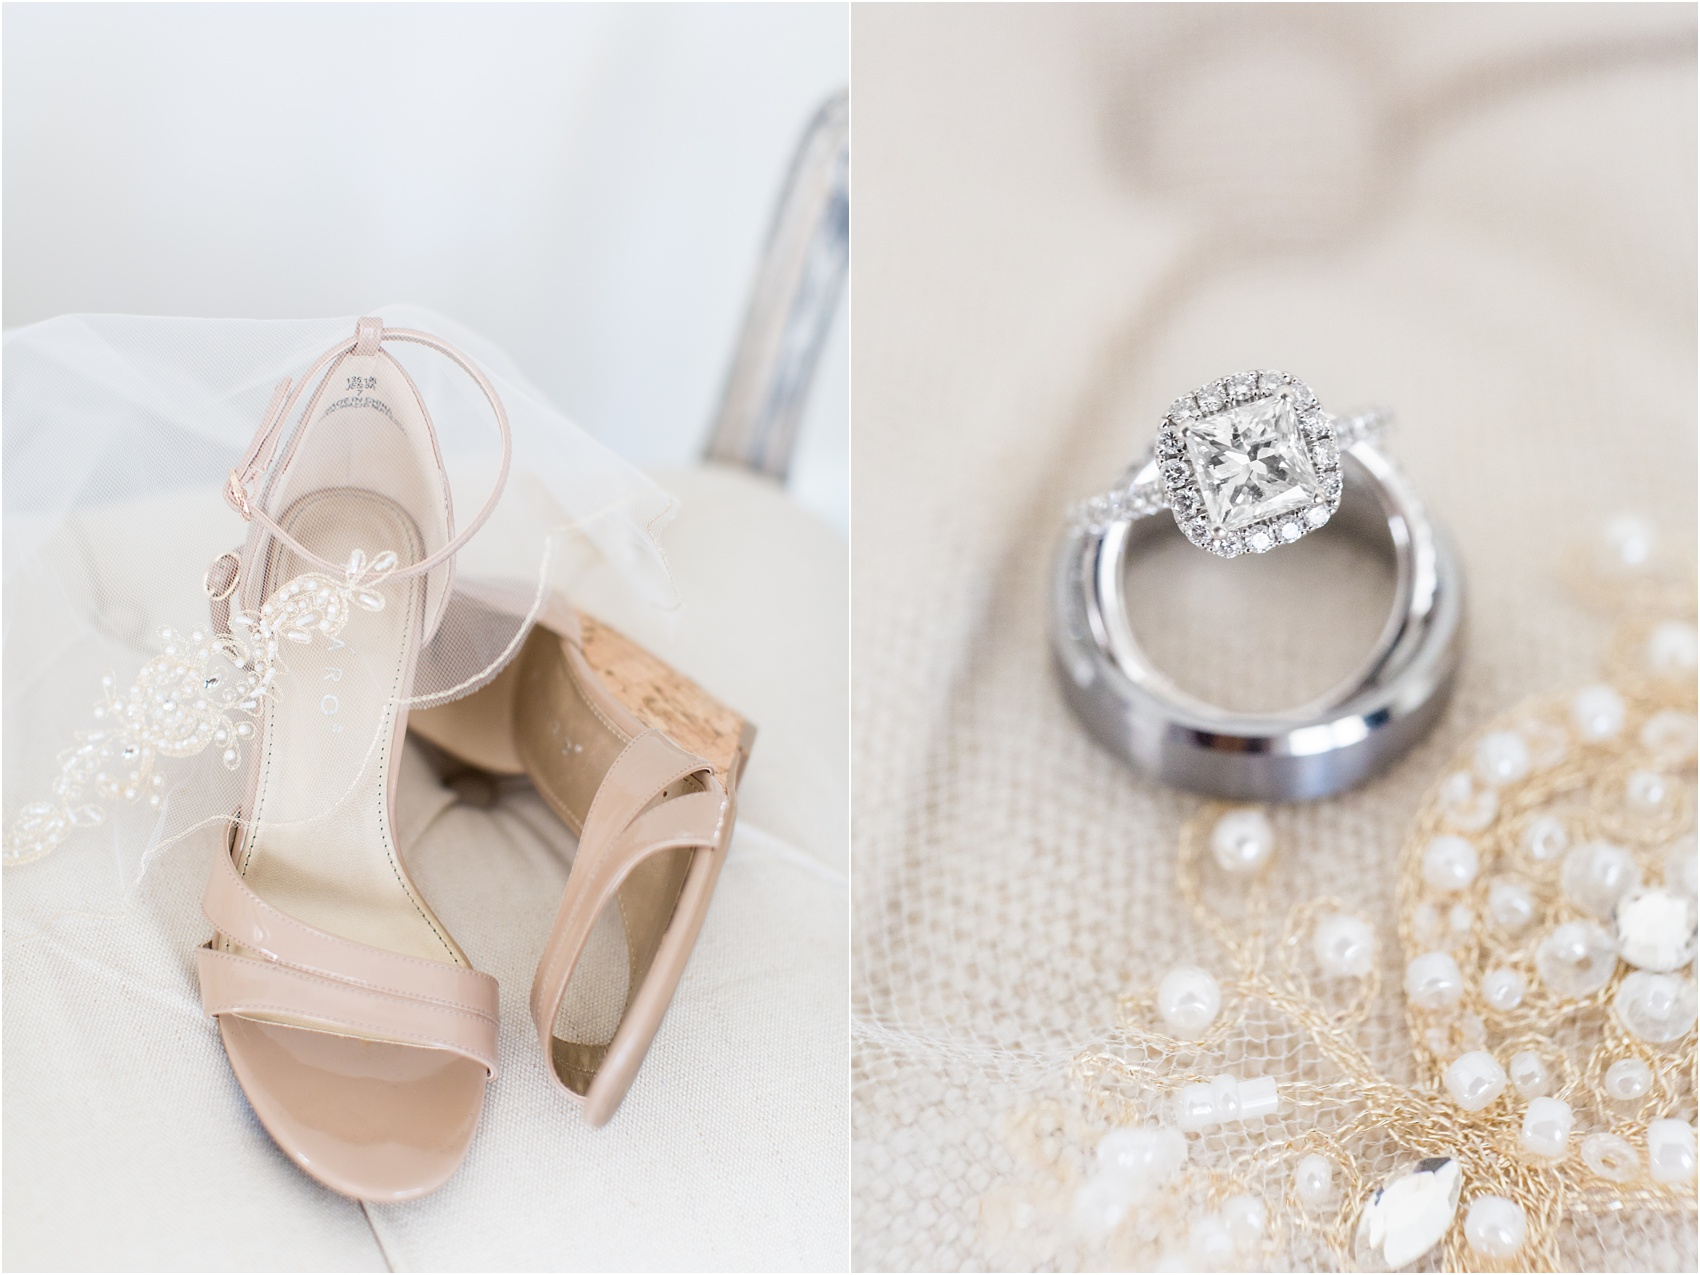 Savannah Eve Photography- Perkins Wedding- Blog-1.jpg